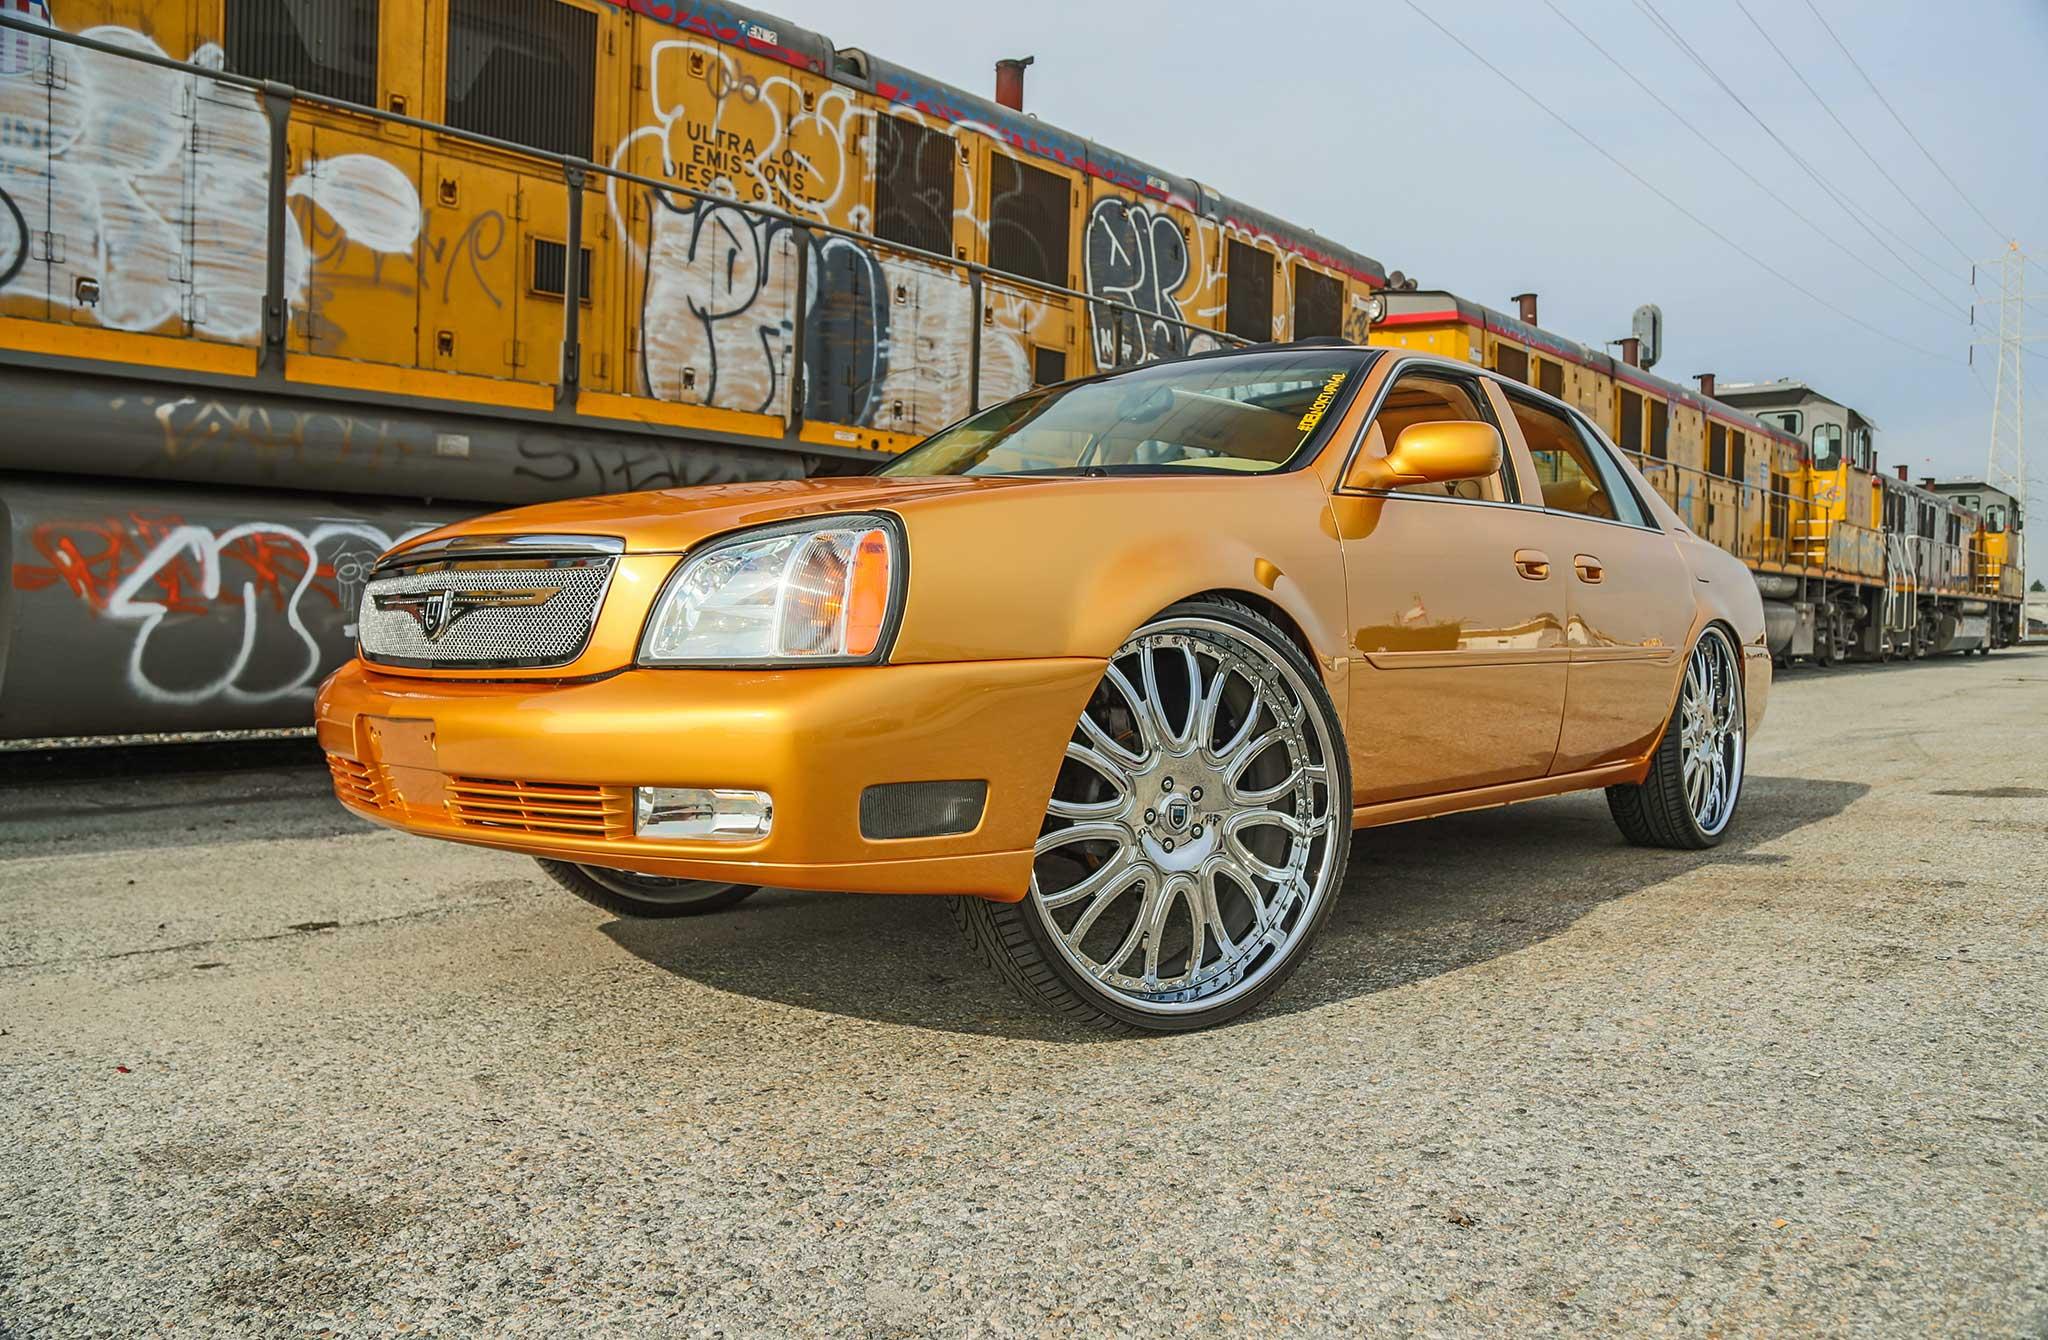 2001-cadillac-deville-asanti-26-inch-wheel1 - Lowrider